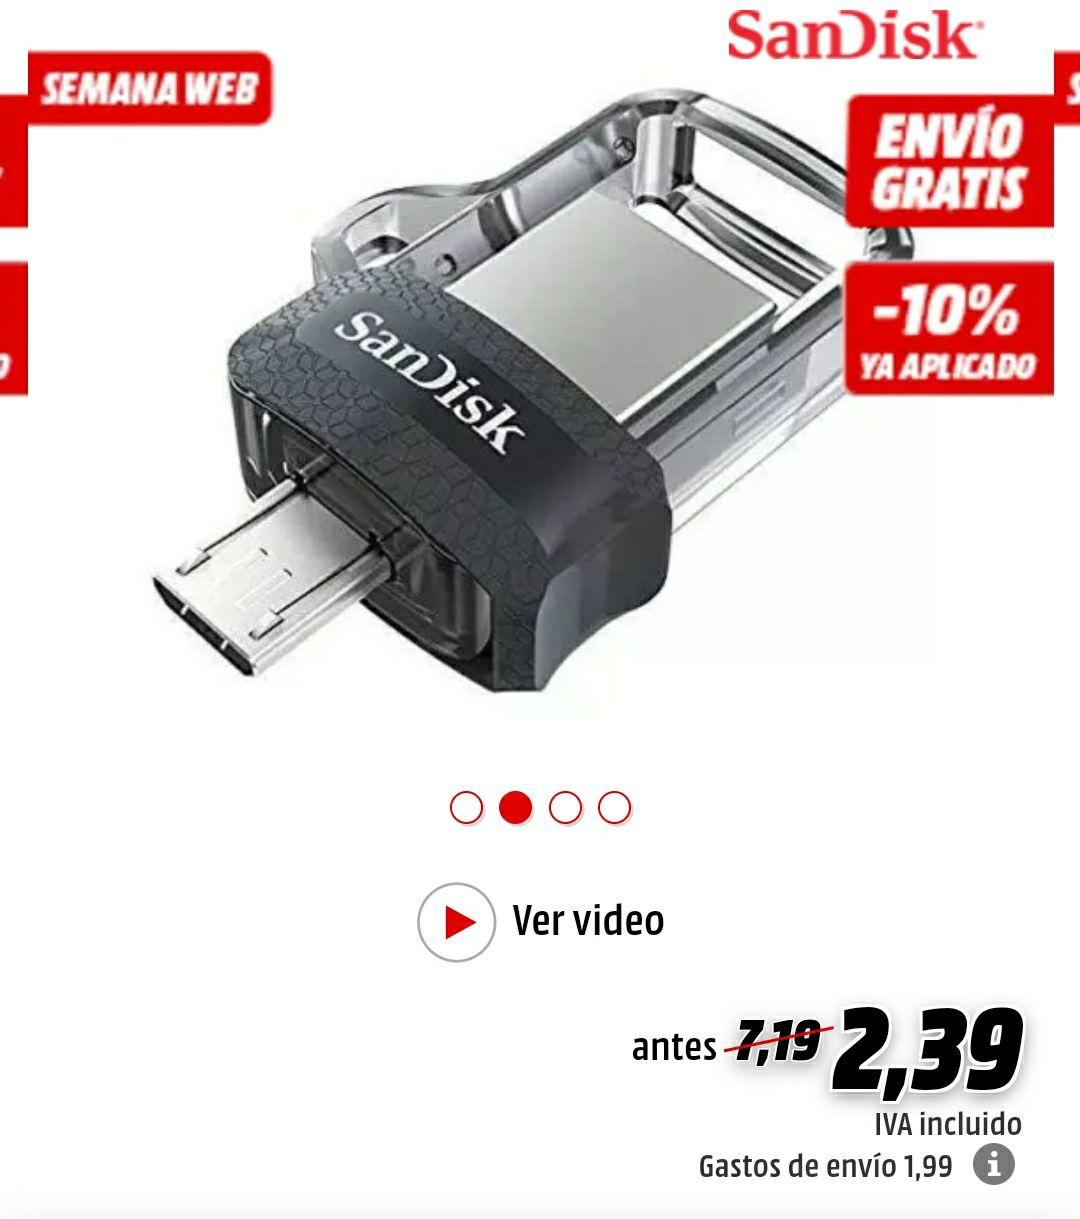 Memoria USB 16 GB - SanDisk Ultra Dual Drive M3.0, Micro USB y USB 3.0, 130 MBs, Gris